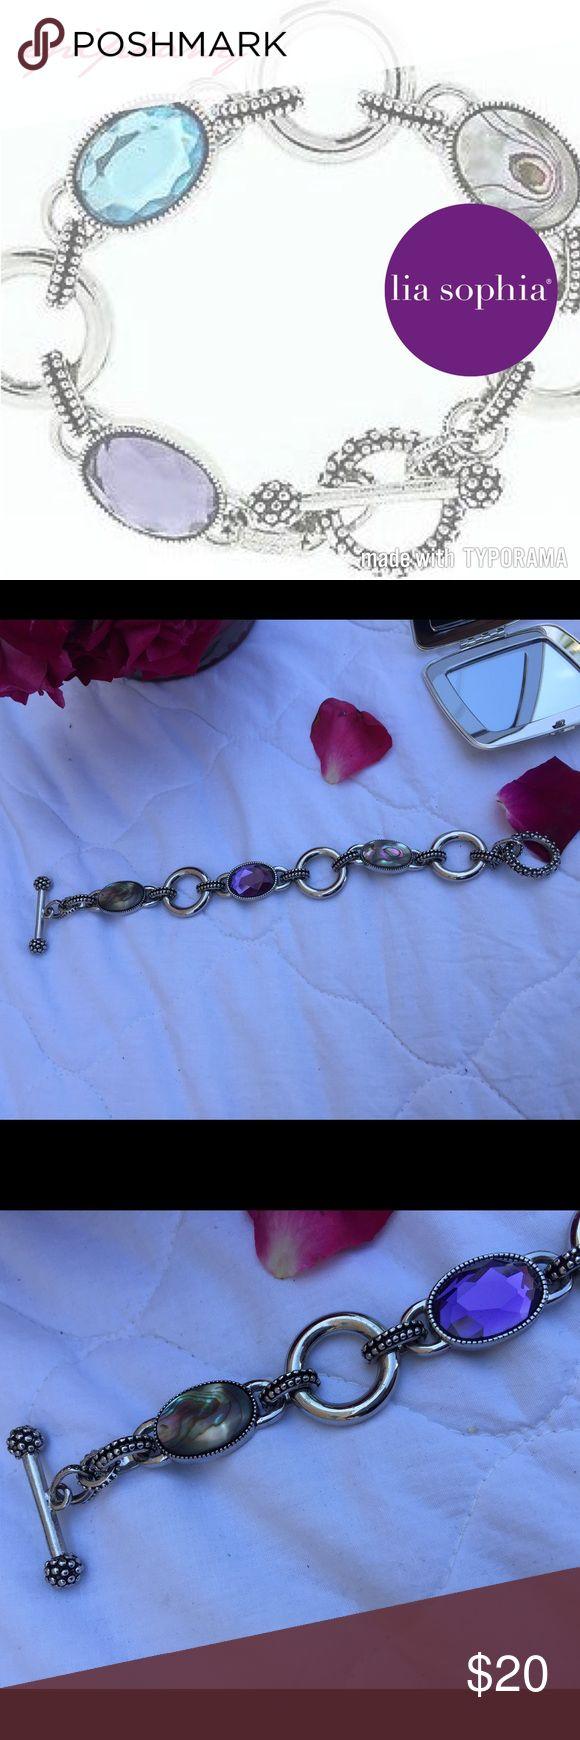 "LIA SOPHIA EPIPHANY Bracelet LIA SOPHIA Collection EPIPHANY Bracelet.  Abalone & Purple Crystal Toggle In Silver.   Size: 8"" Lia Sophia Jewelry Bracelets"